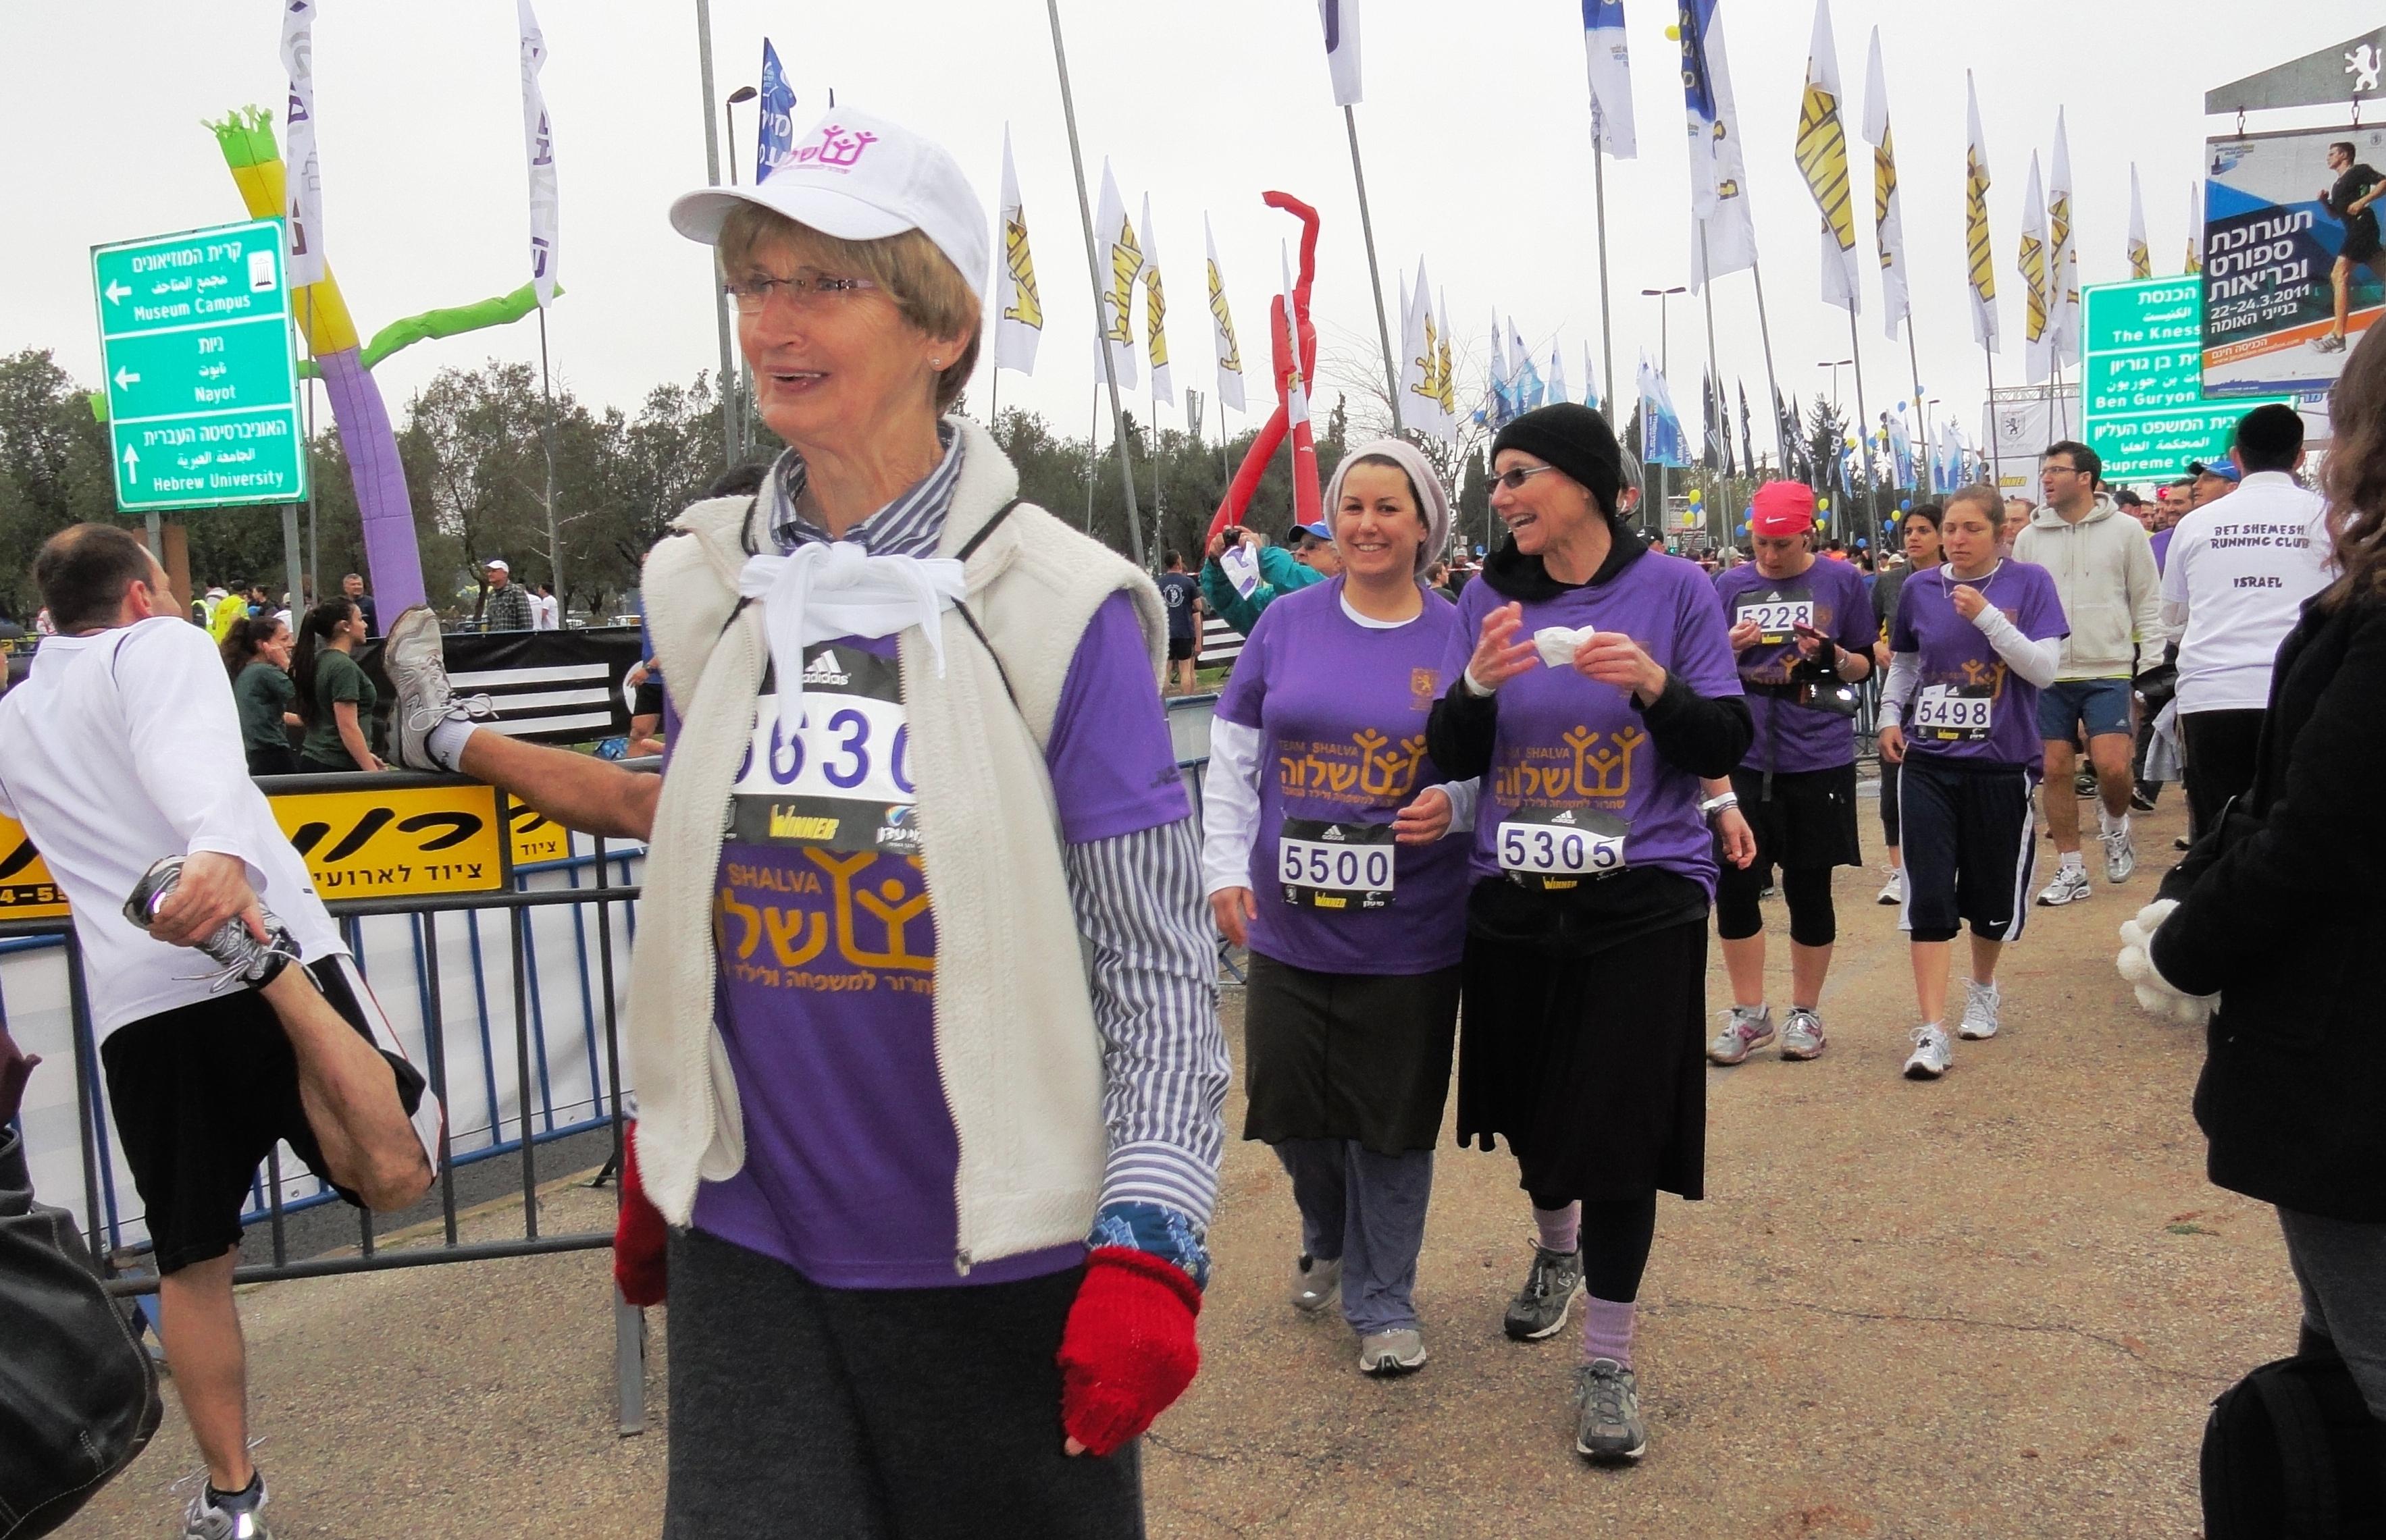 Shalva image, Shalva runners in Jerusalem marathon